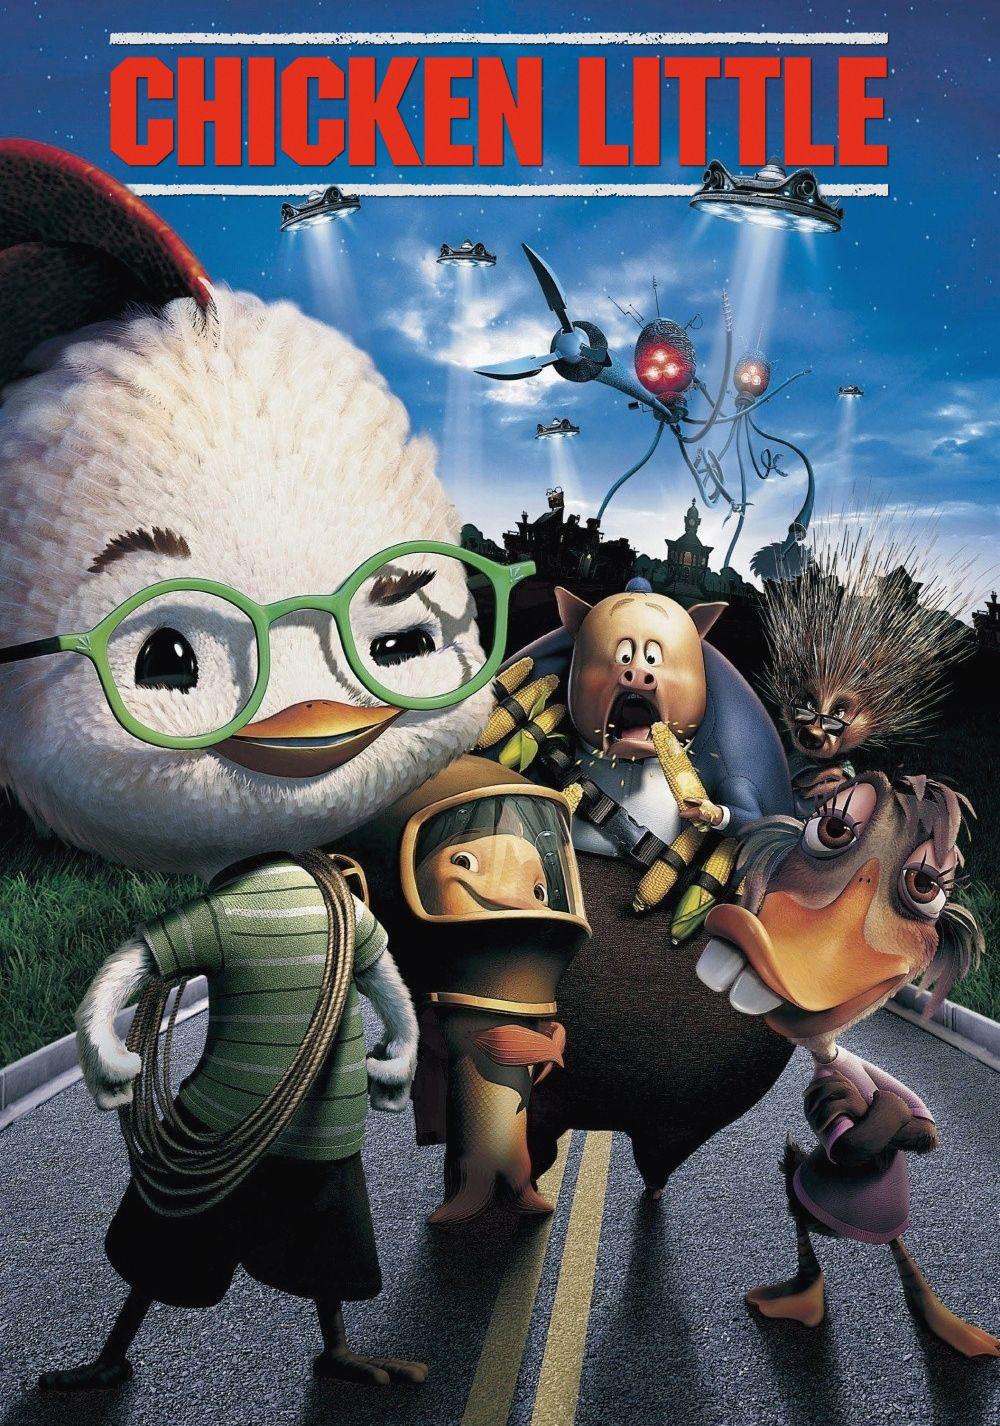 Animated Movie Posters Chicken Little Disney Kid Movies [ 1426 x 1000 Pixel ]